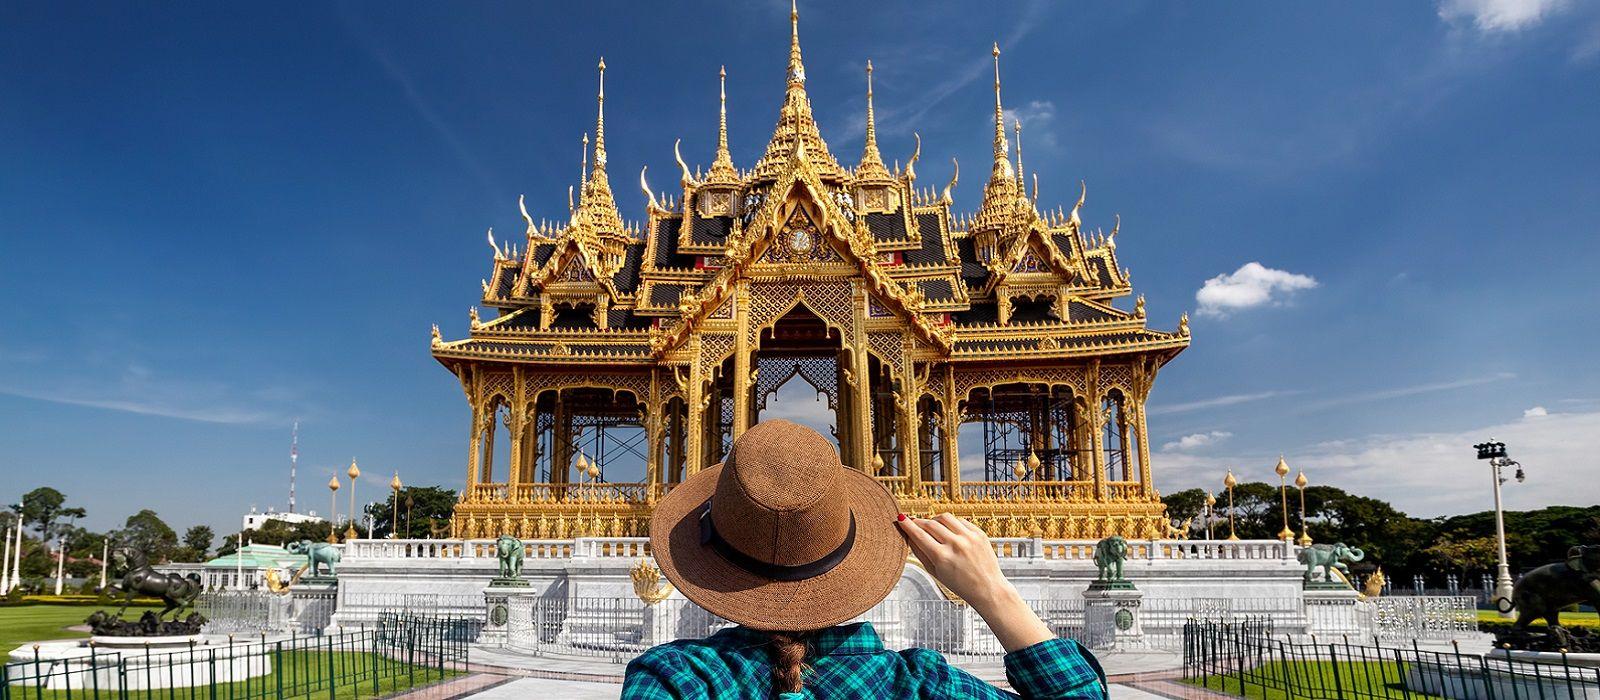 Urban Hotspots of Asia Tour Trip 6